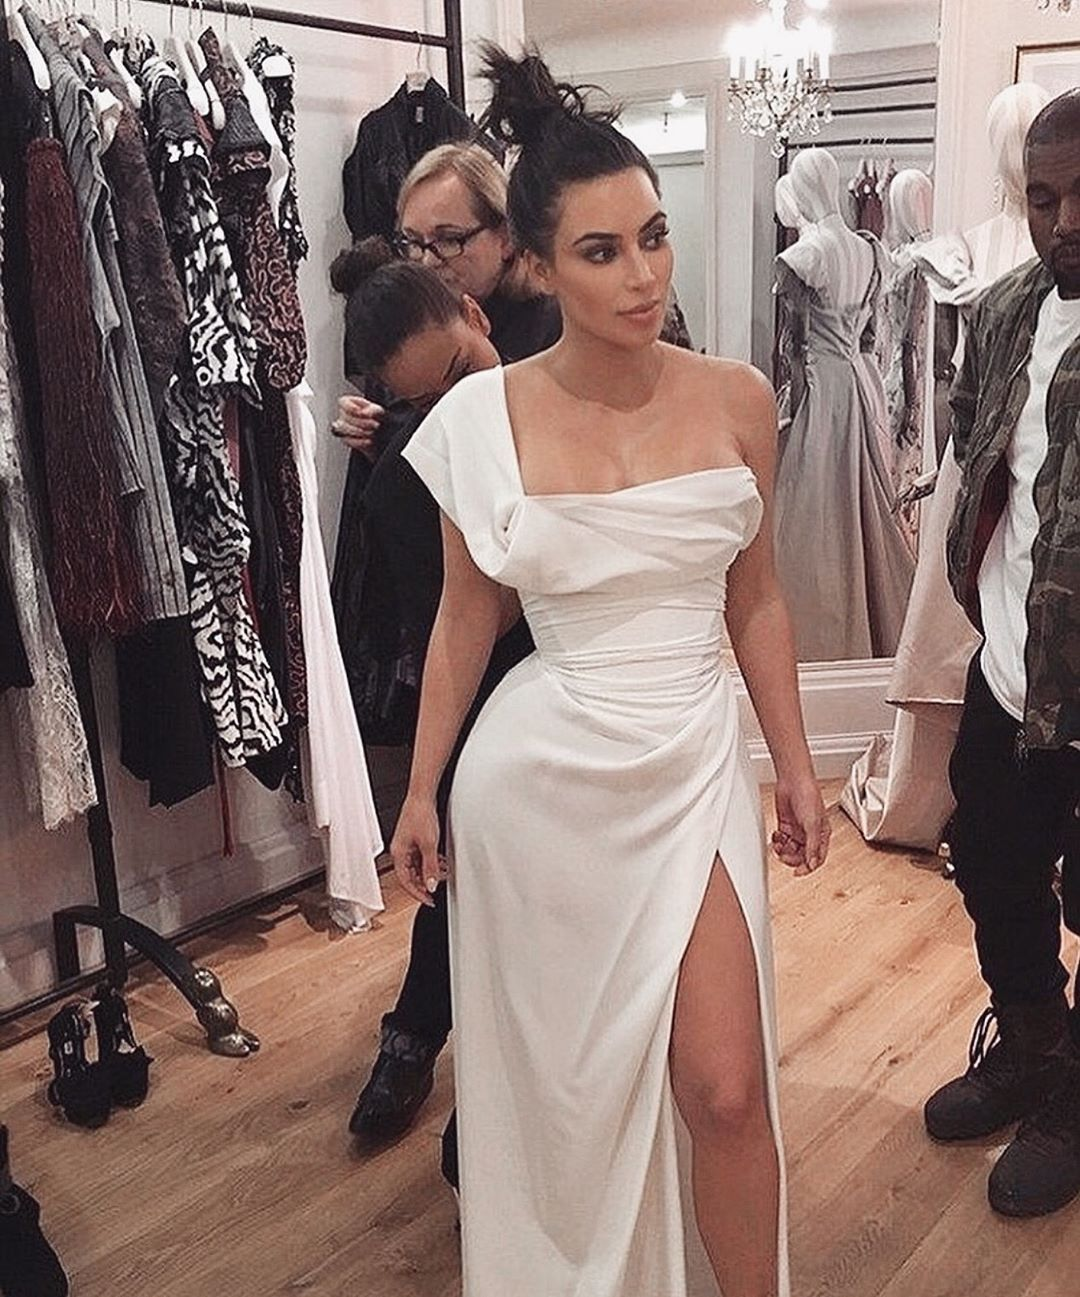 Pin By Selena Gomez On Say Yes Fashion Vivienne Westwood Dress Kardashian Style [ 1297 x 1080 Pixel ]